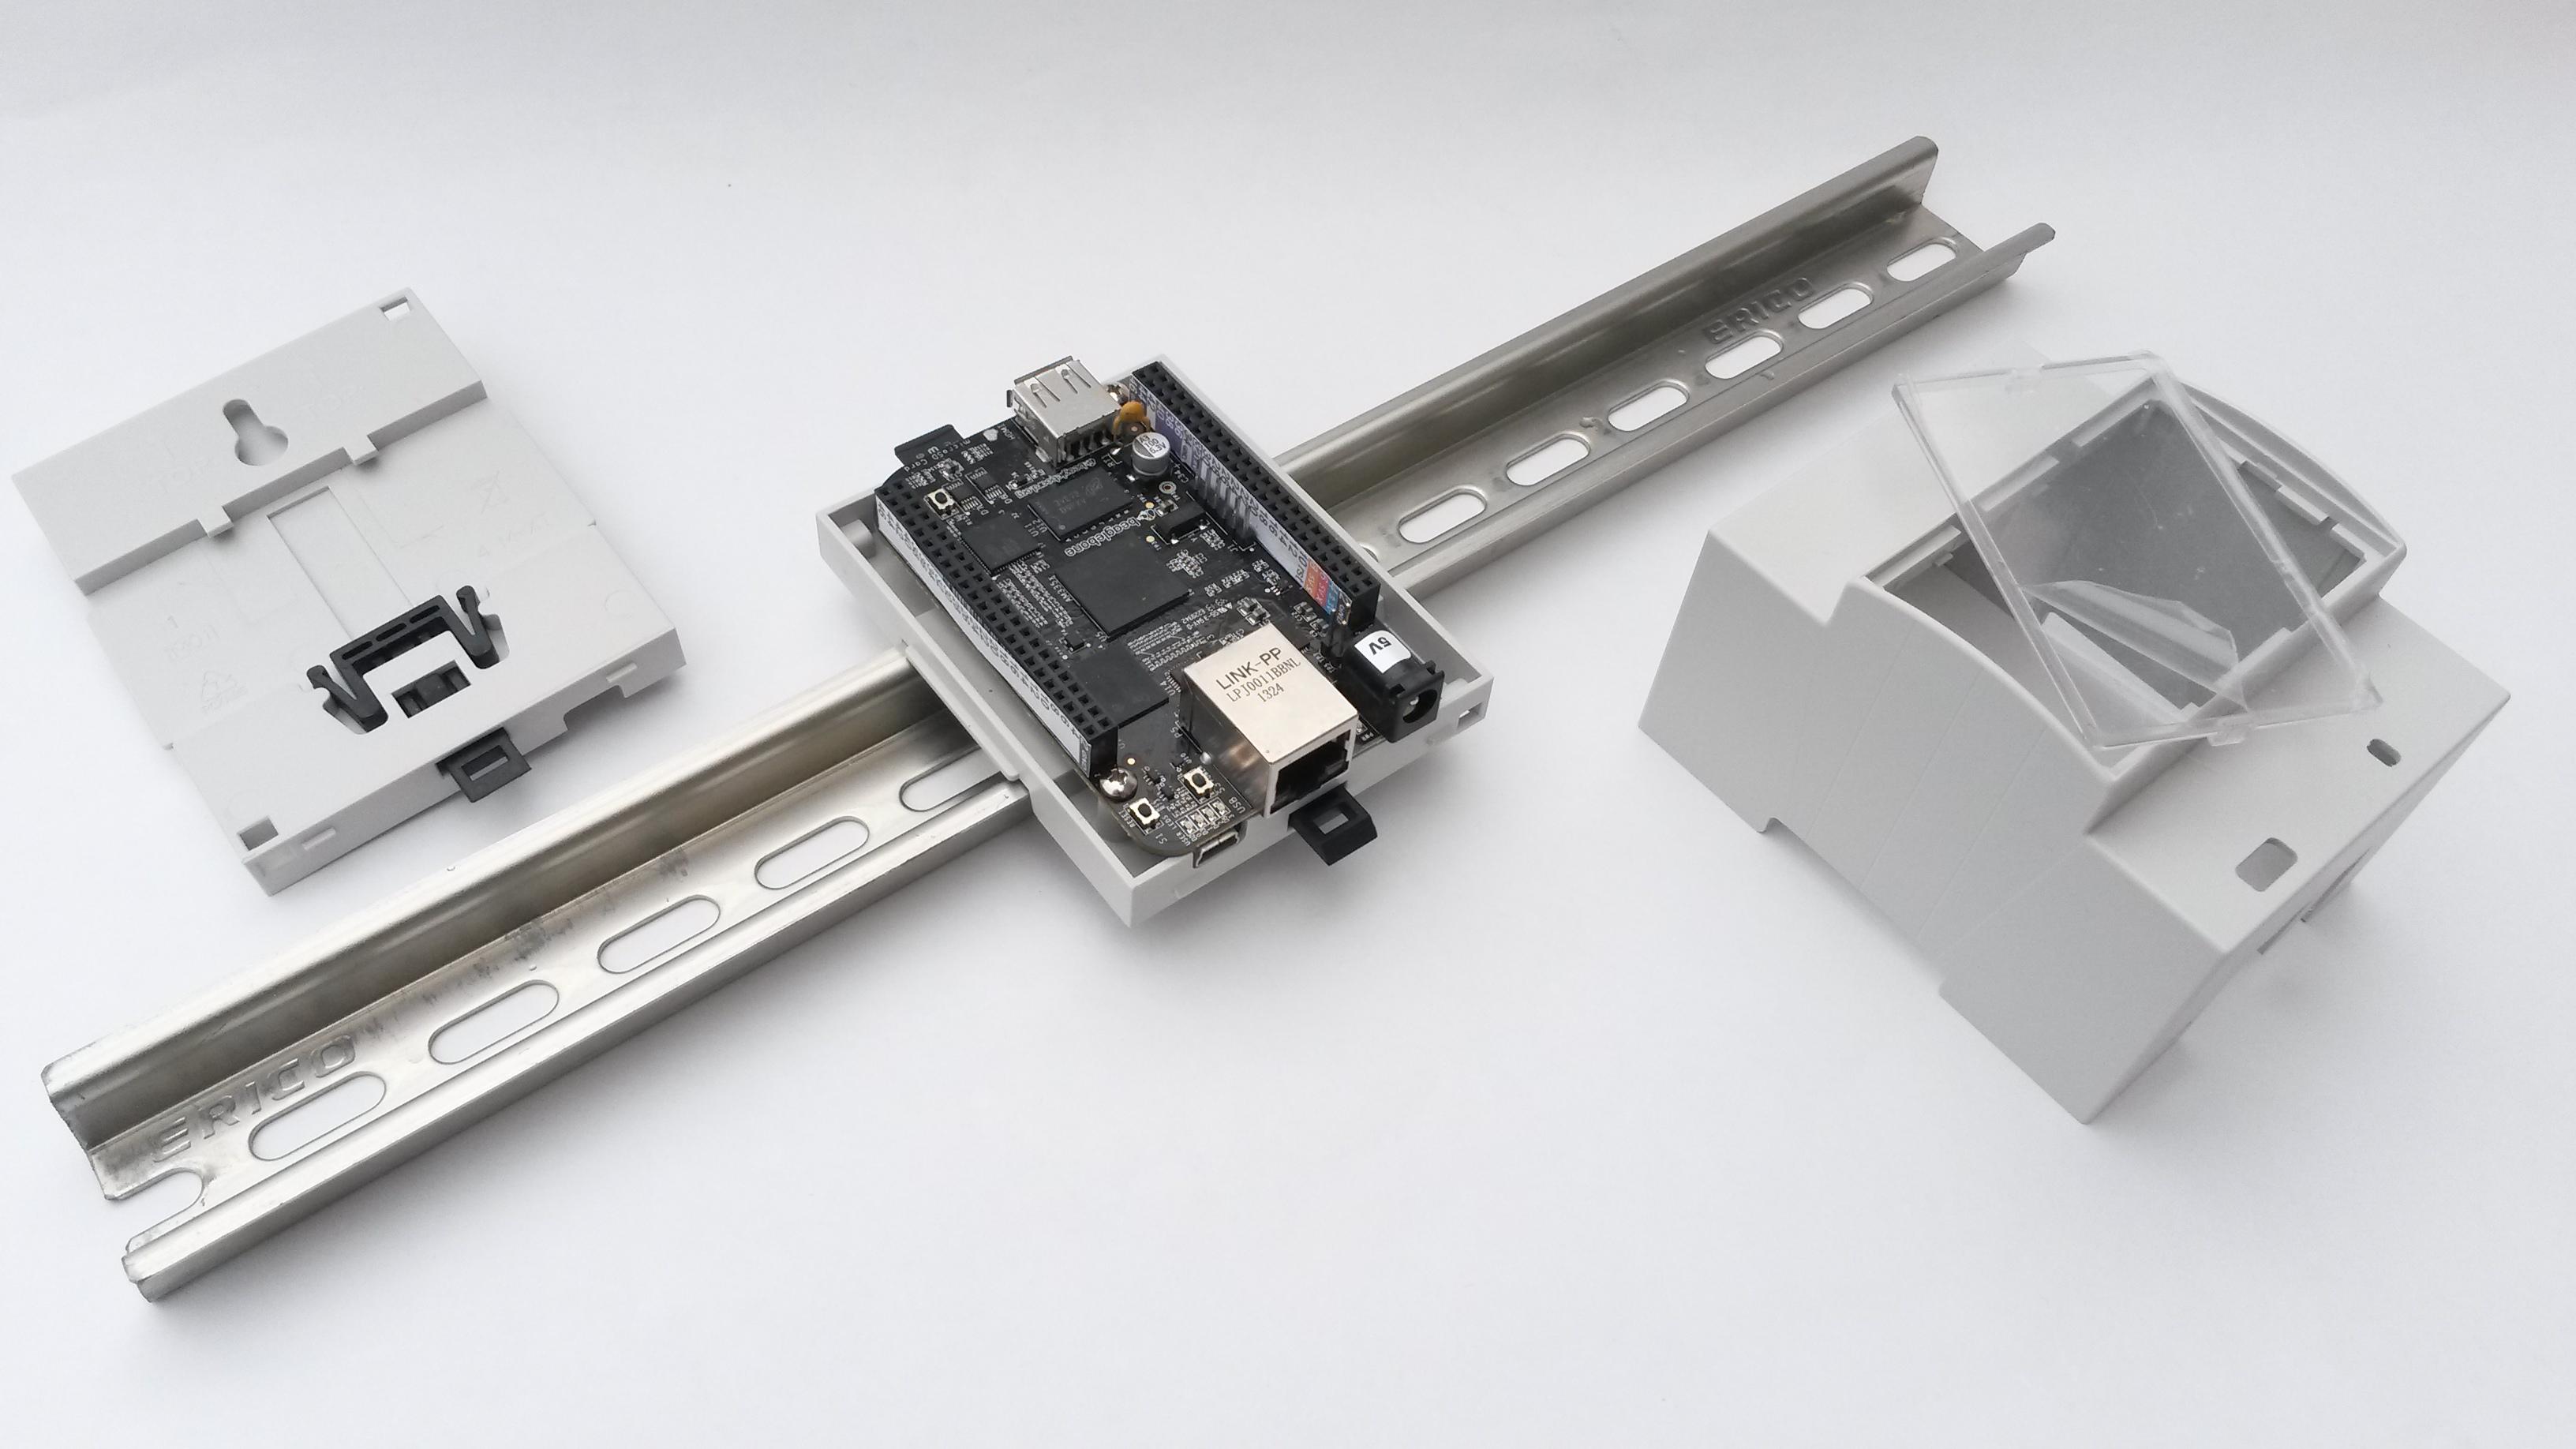 Uninterruptible Power Supply (UPS) for BeagleBone Black – a DIY